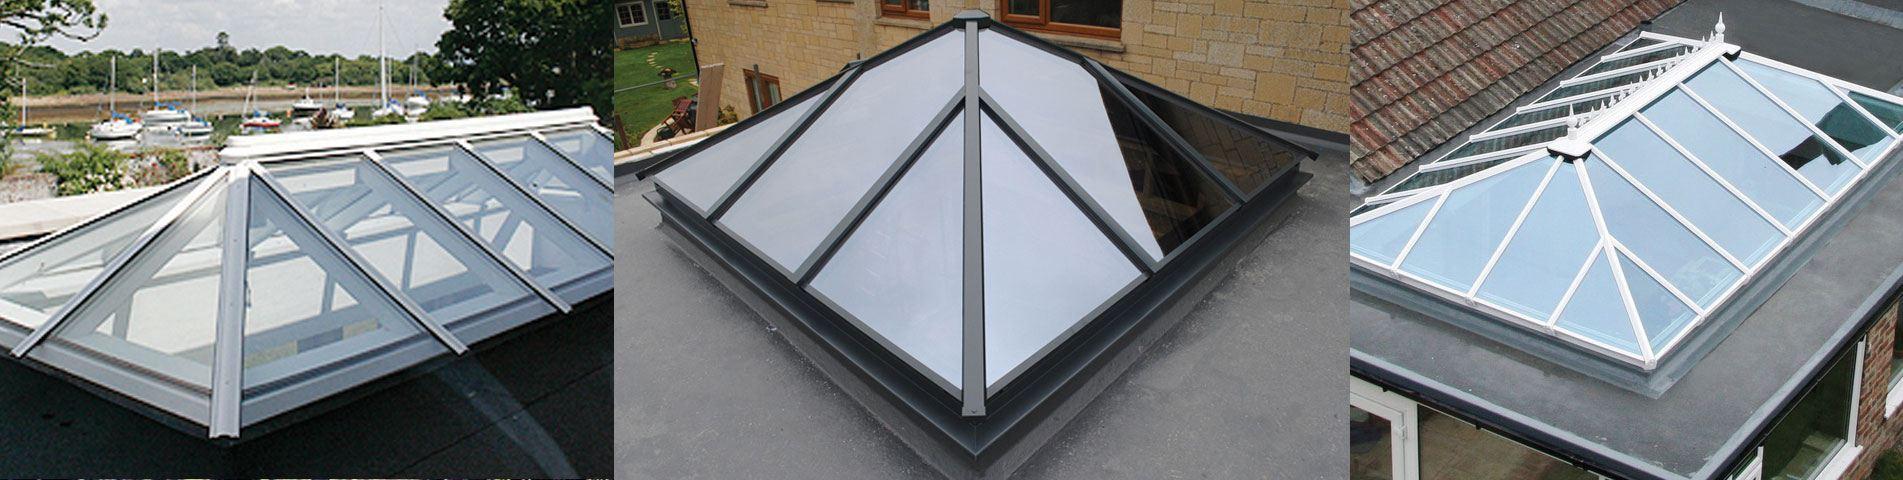 skylights-rooflights-nottingham